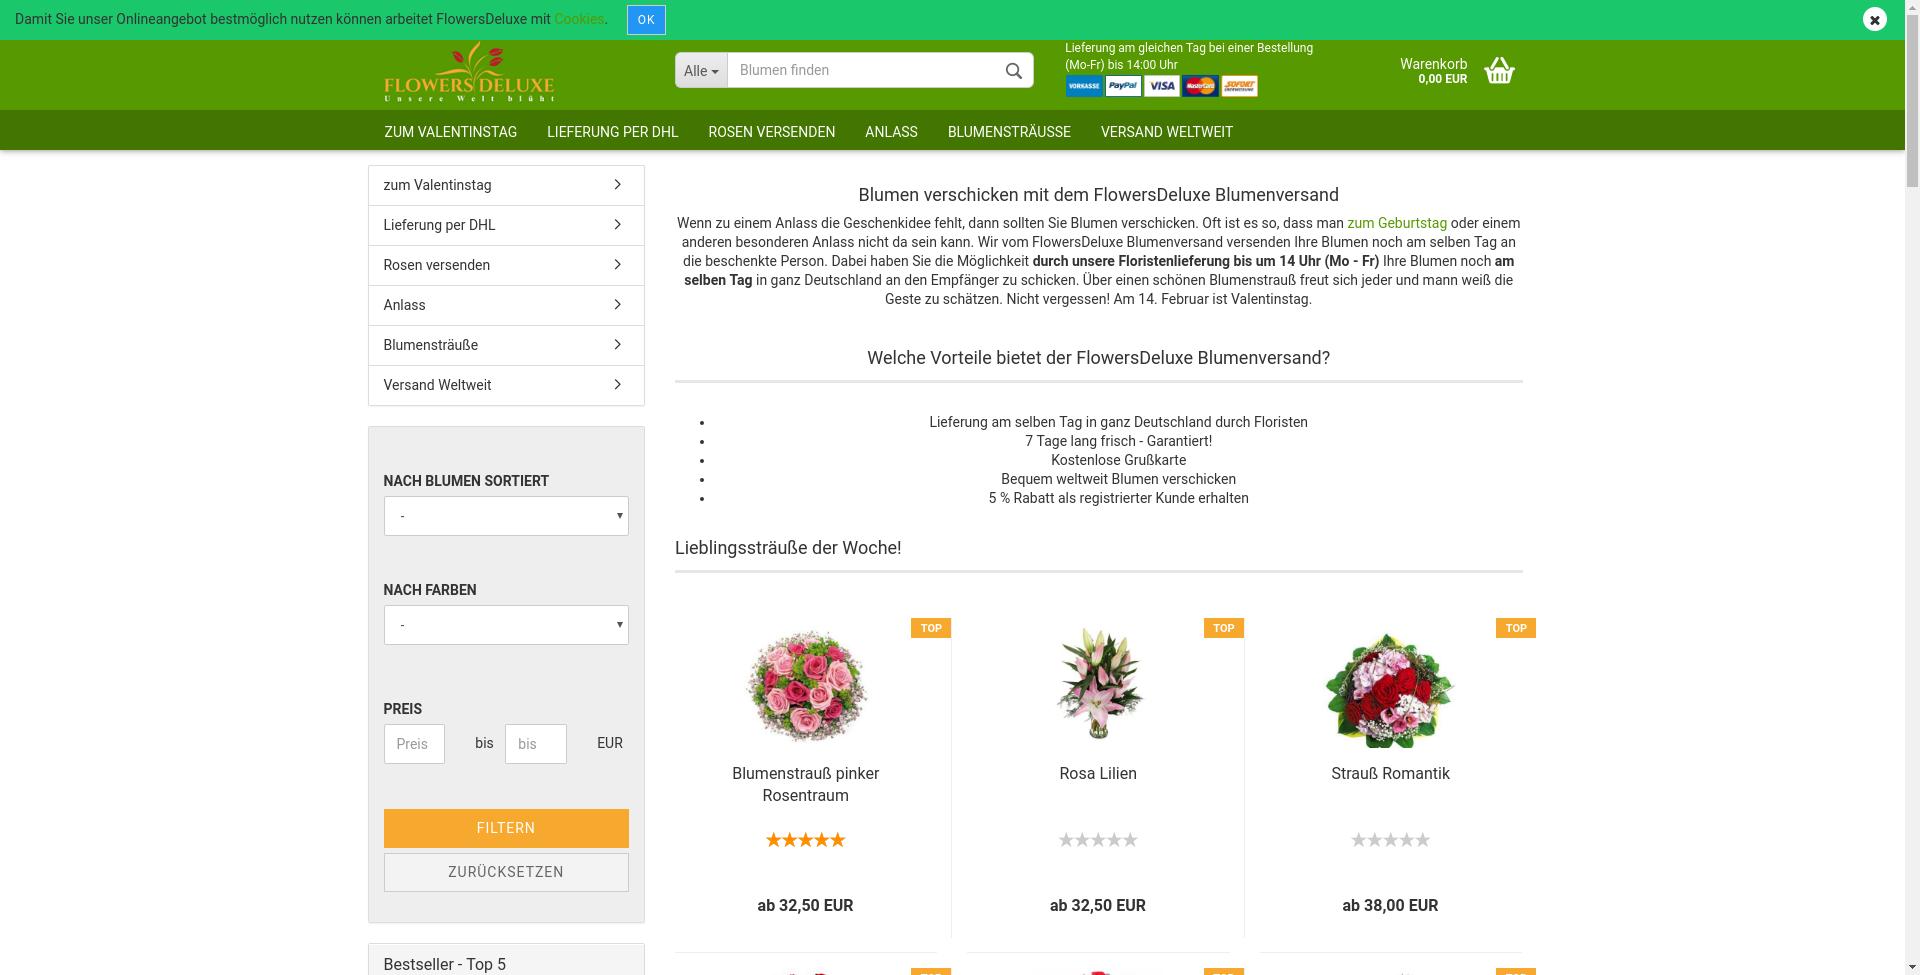 FlowersDeluxe